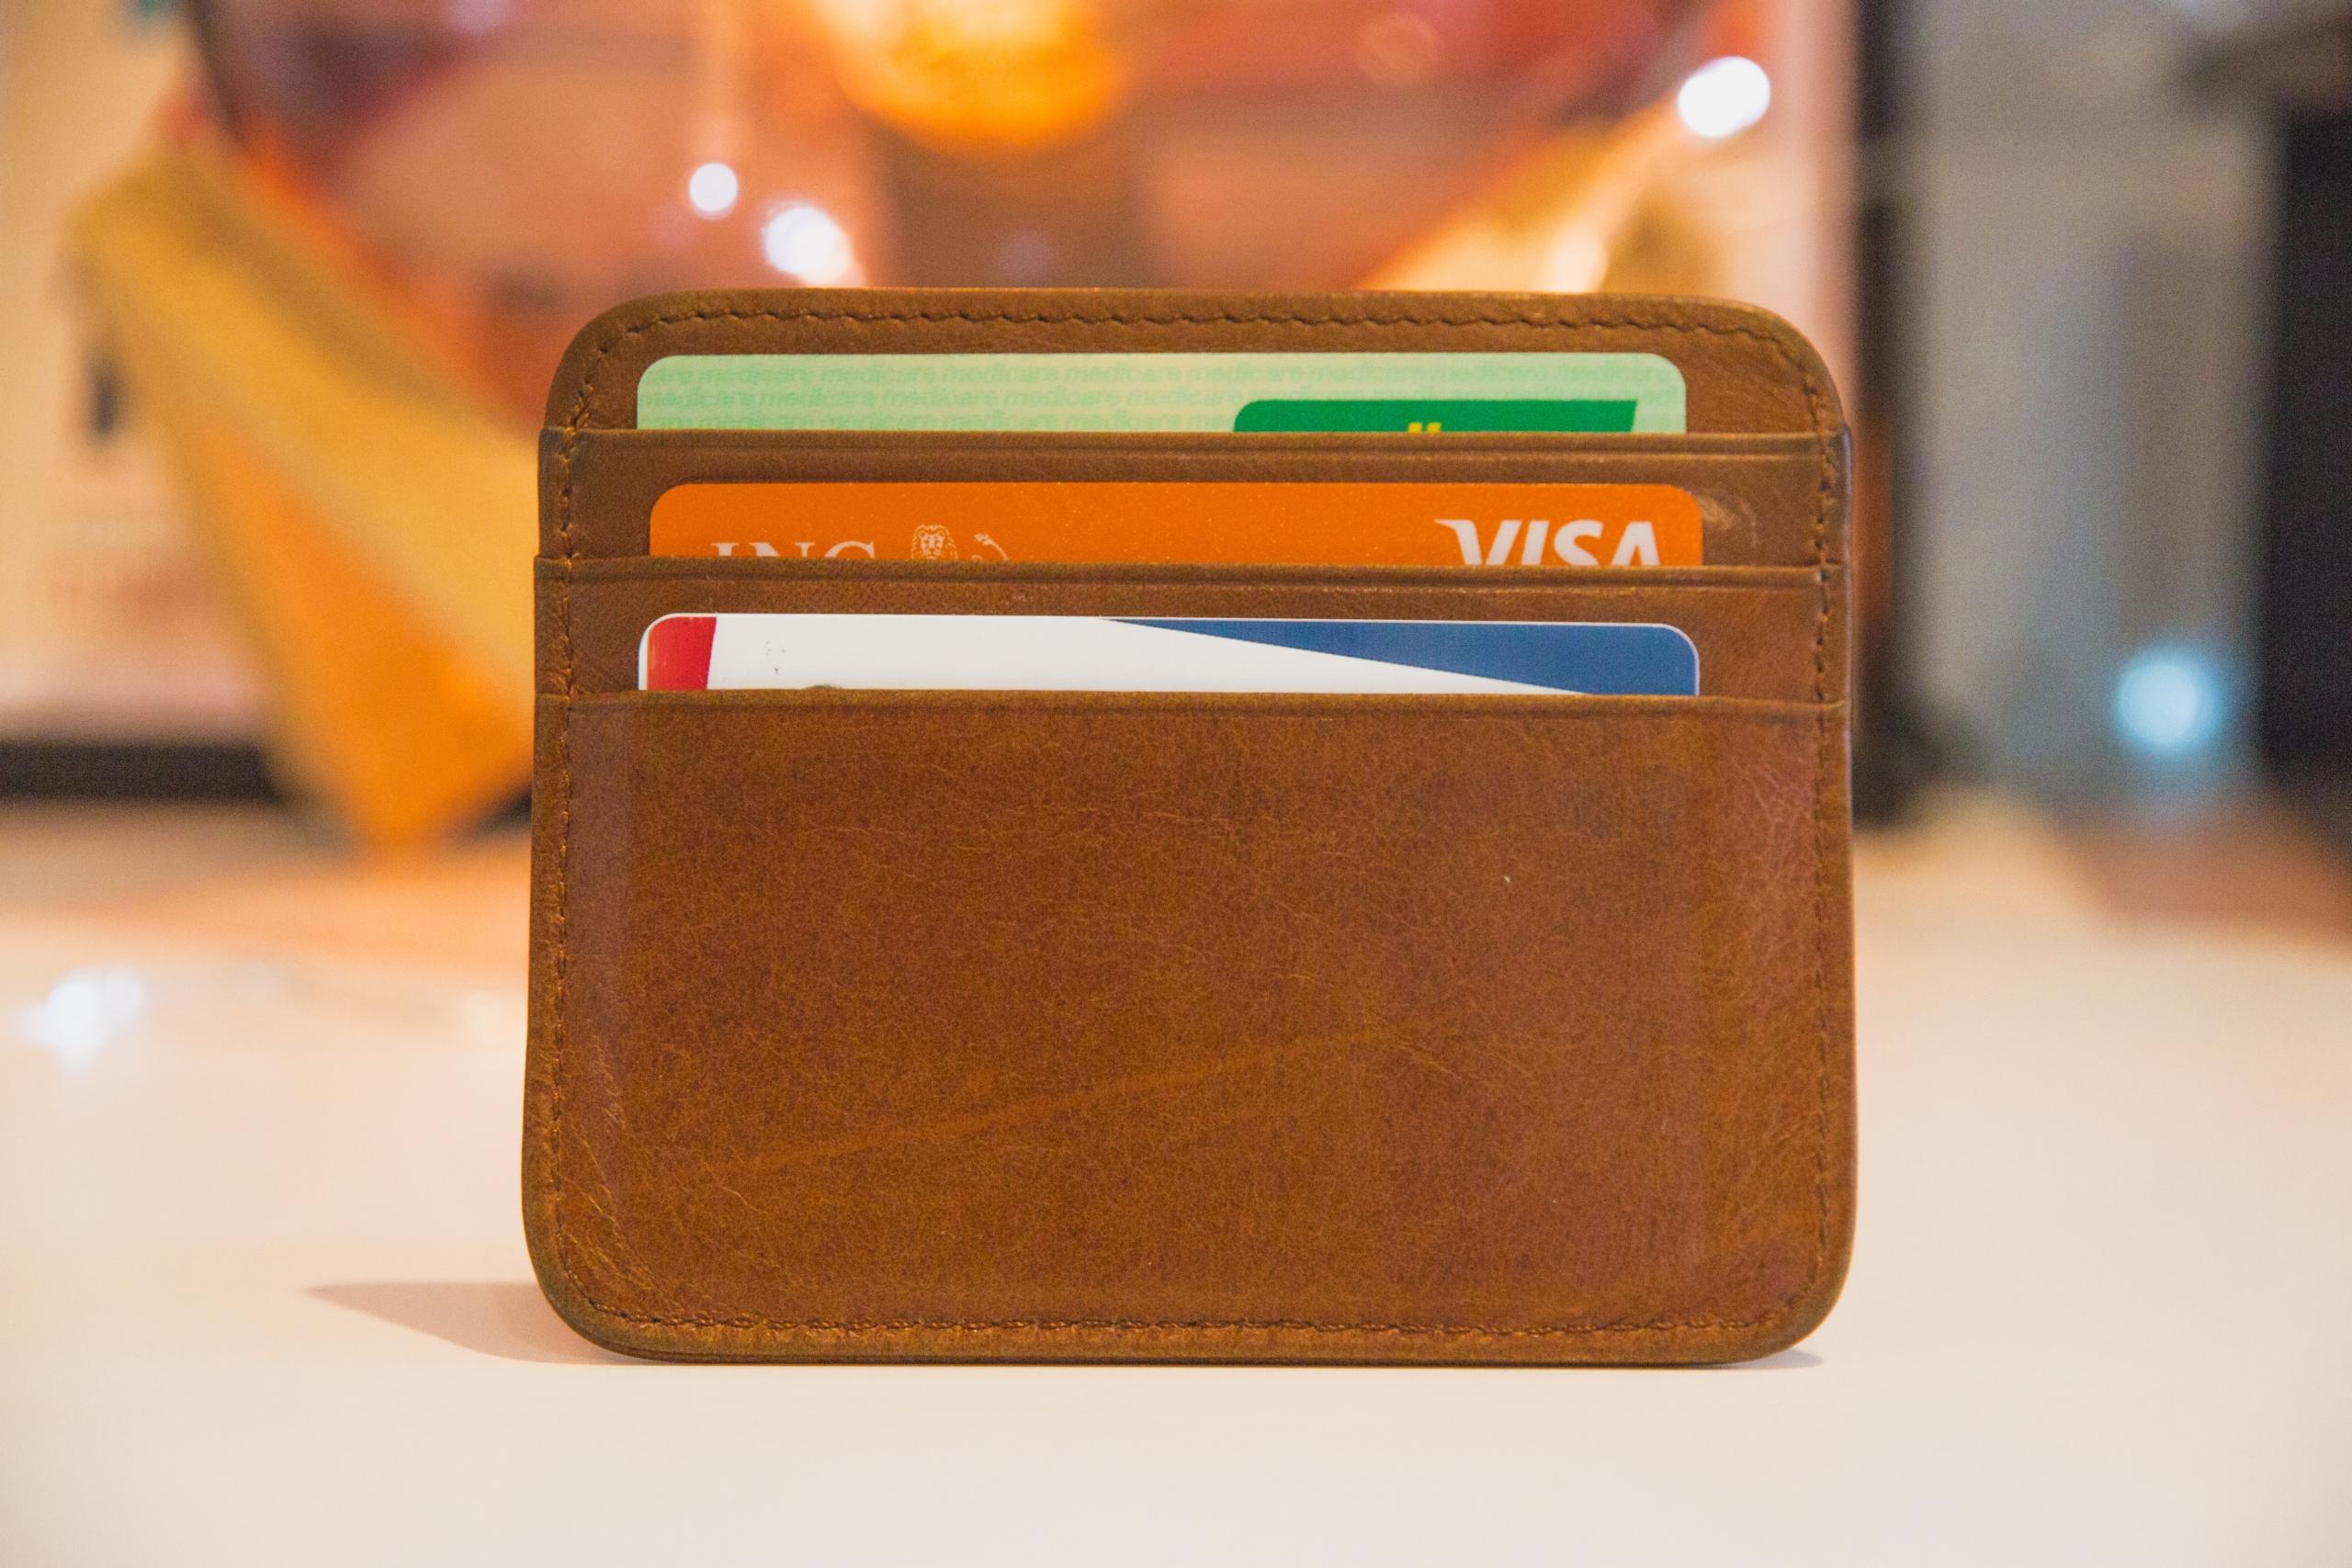 How Do Balance Transfer Credit Cards Work?